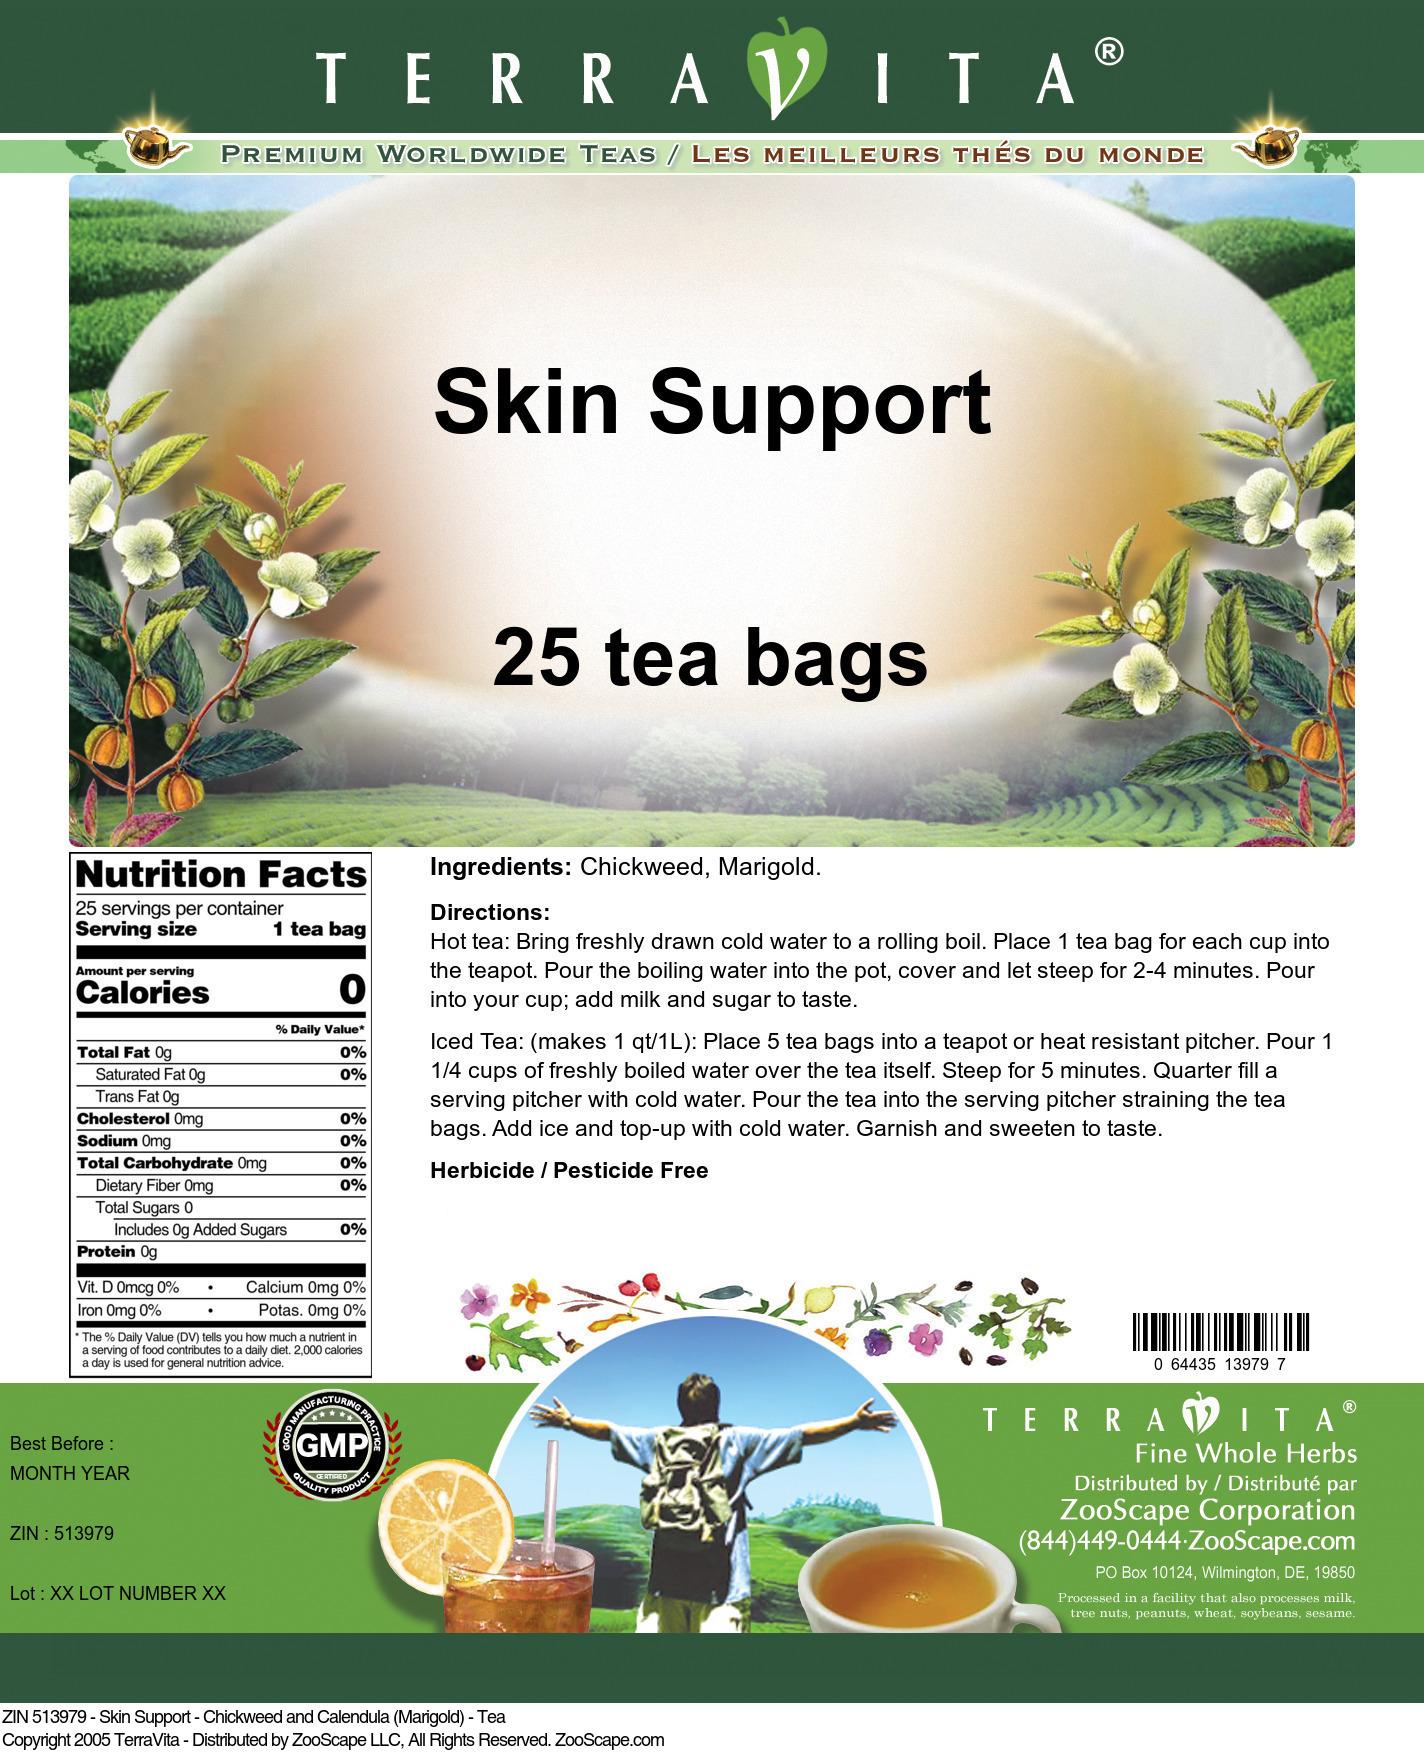 Skin Support - Chickweed and Calendula (Marigold) - Tea